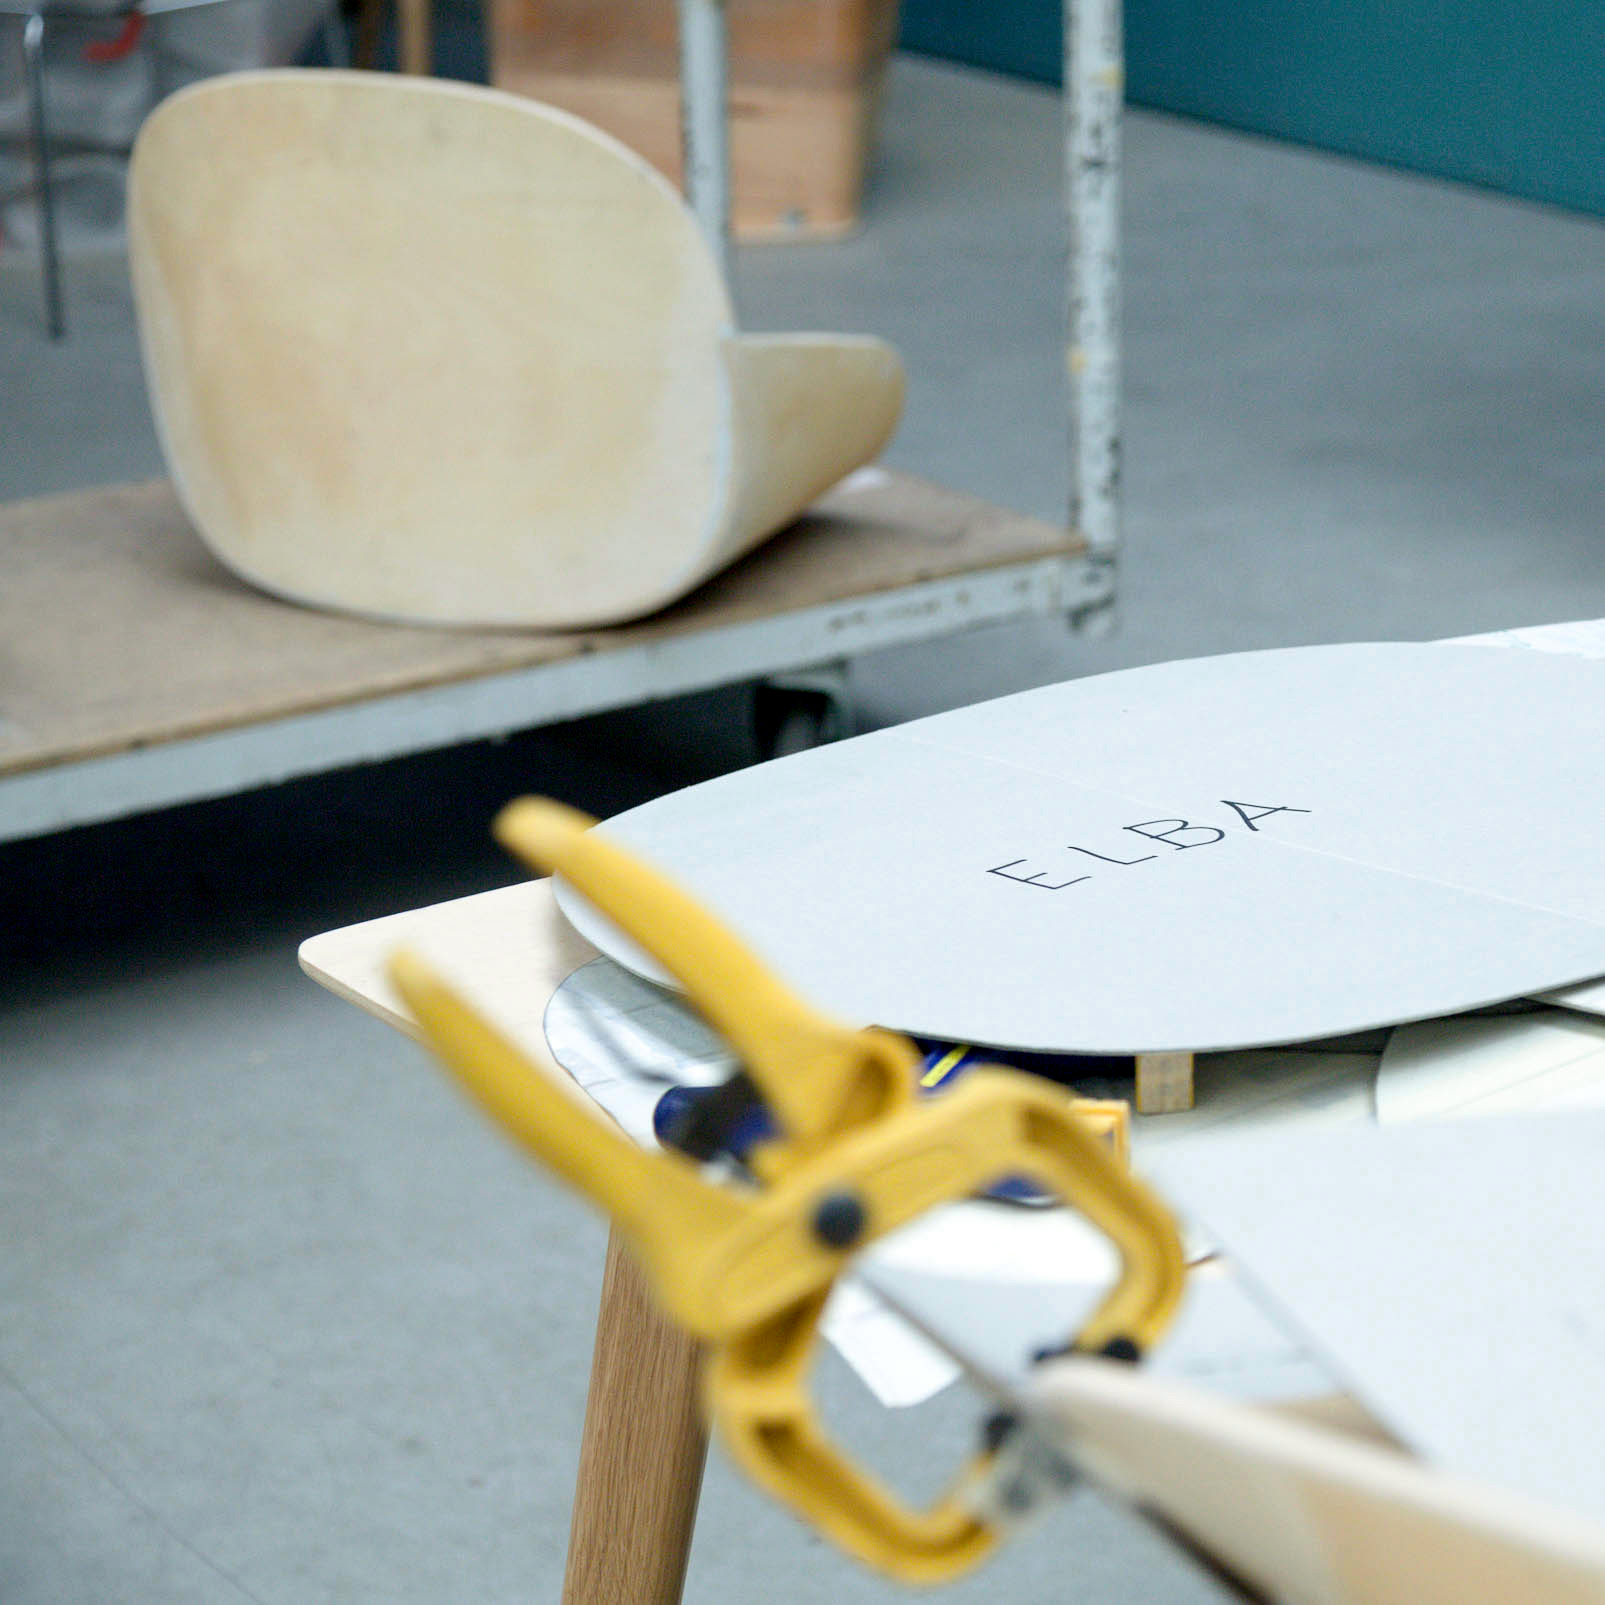 Elba chair model making